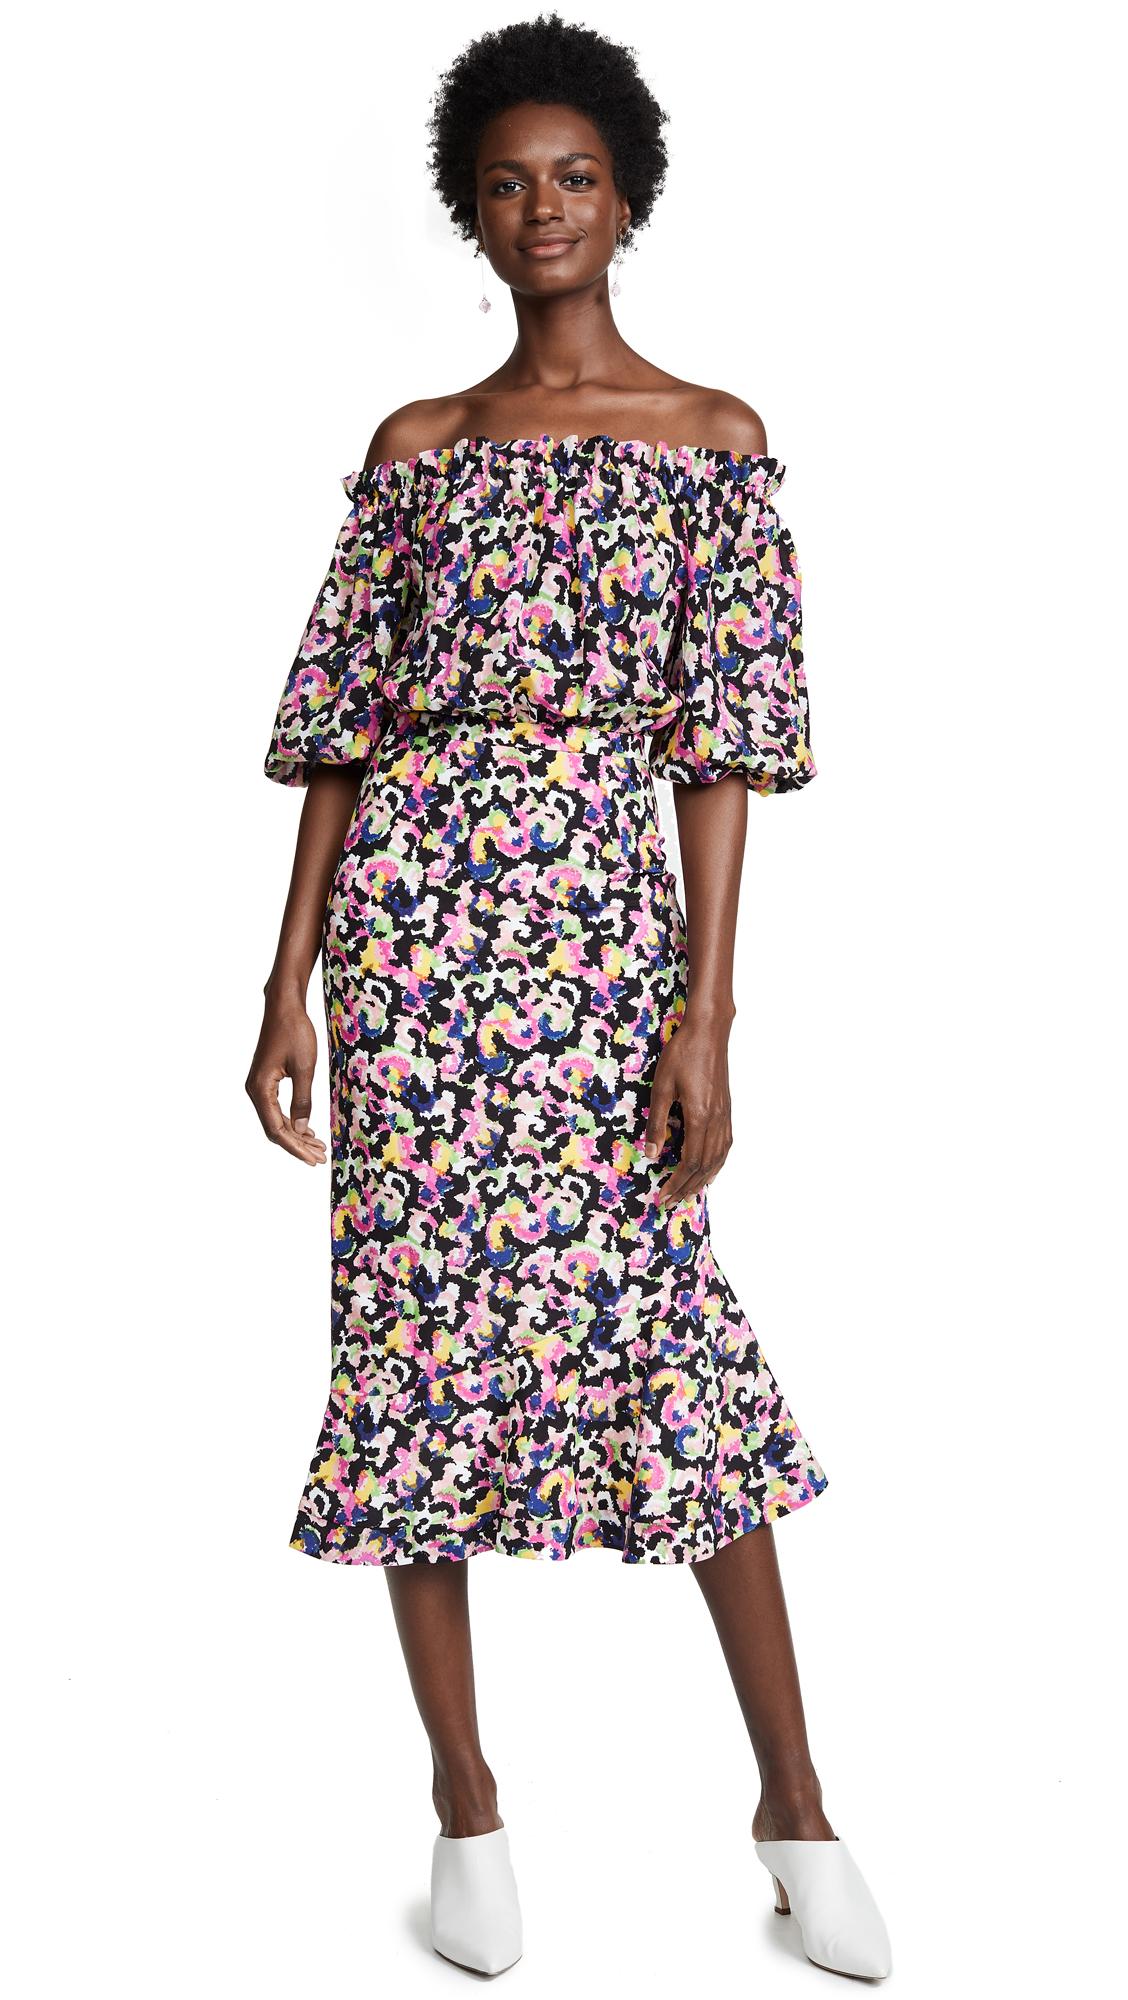 Saloni Grace Dress - Hothouse Mirage